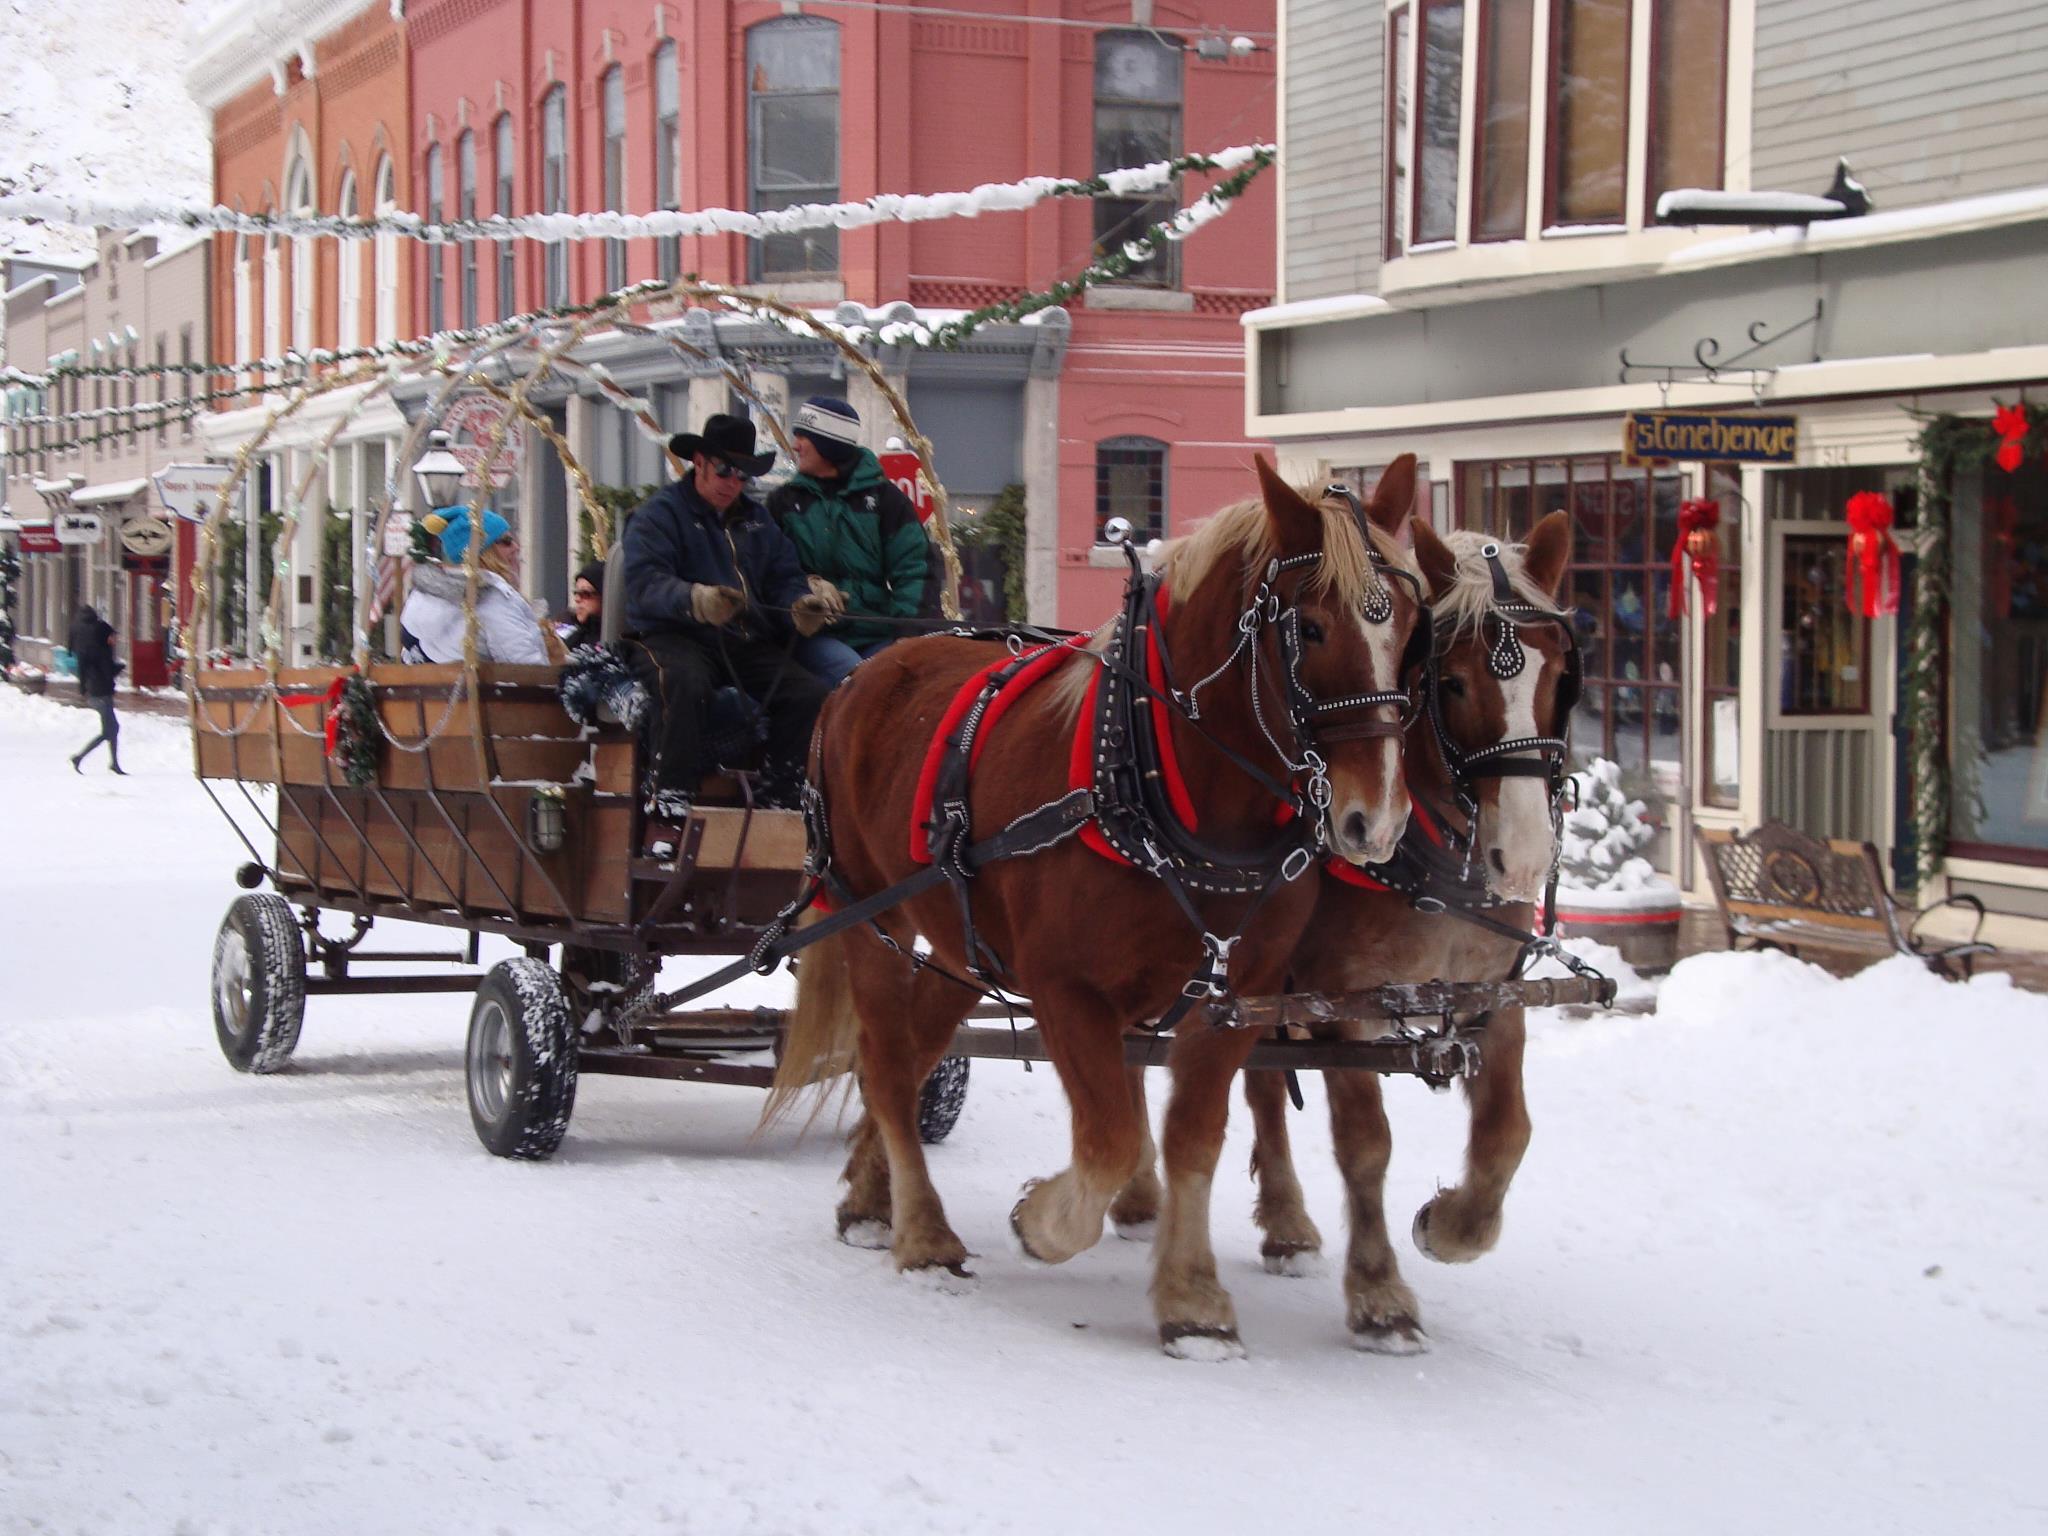 Top 5 Colorado Christmas Towns - HeidiTown